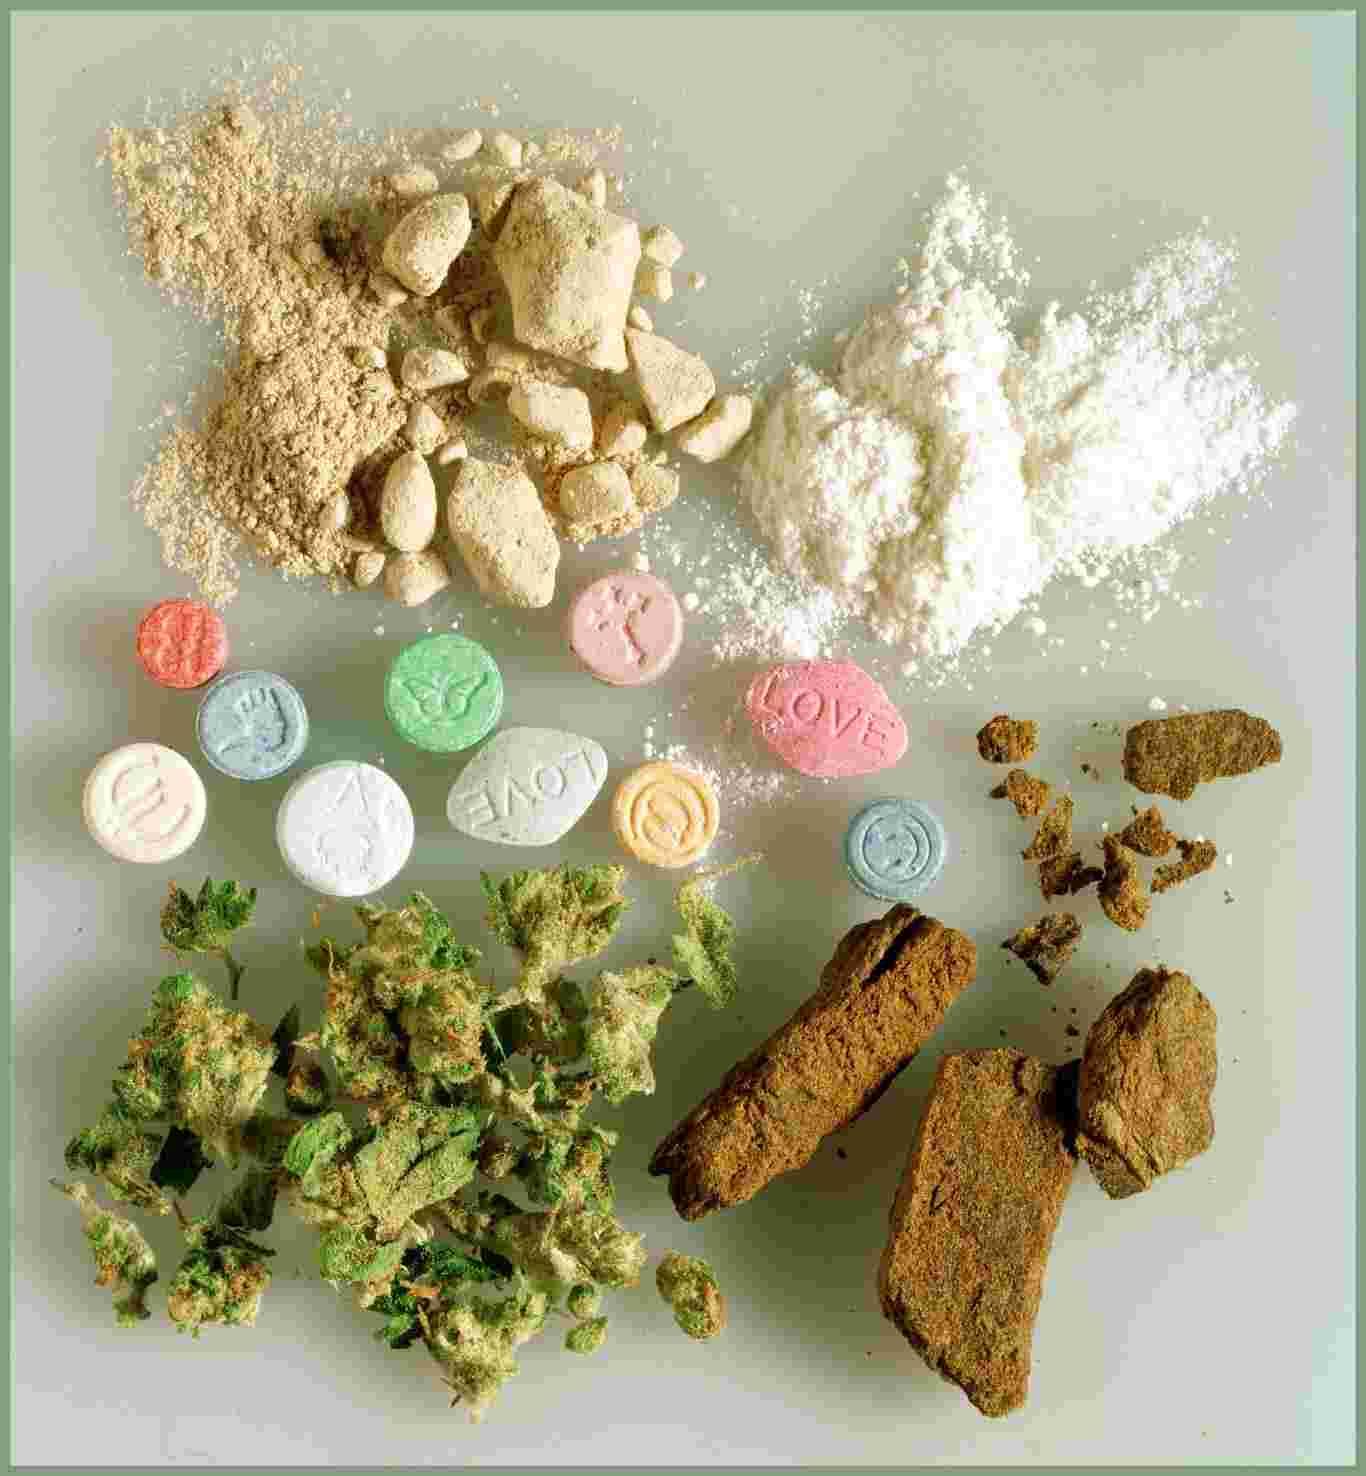 drugsfotoverkleind